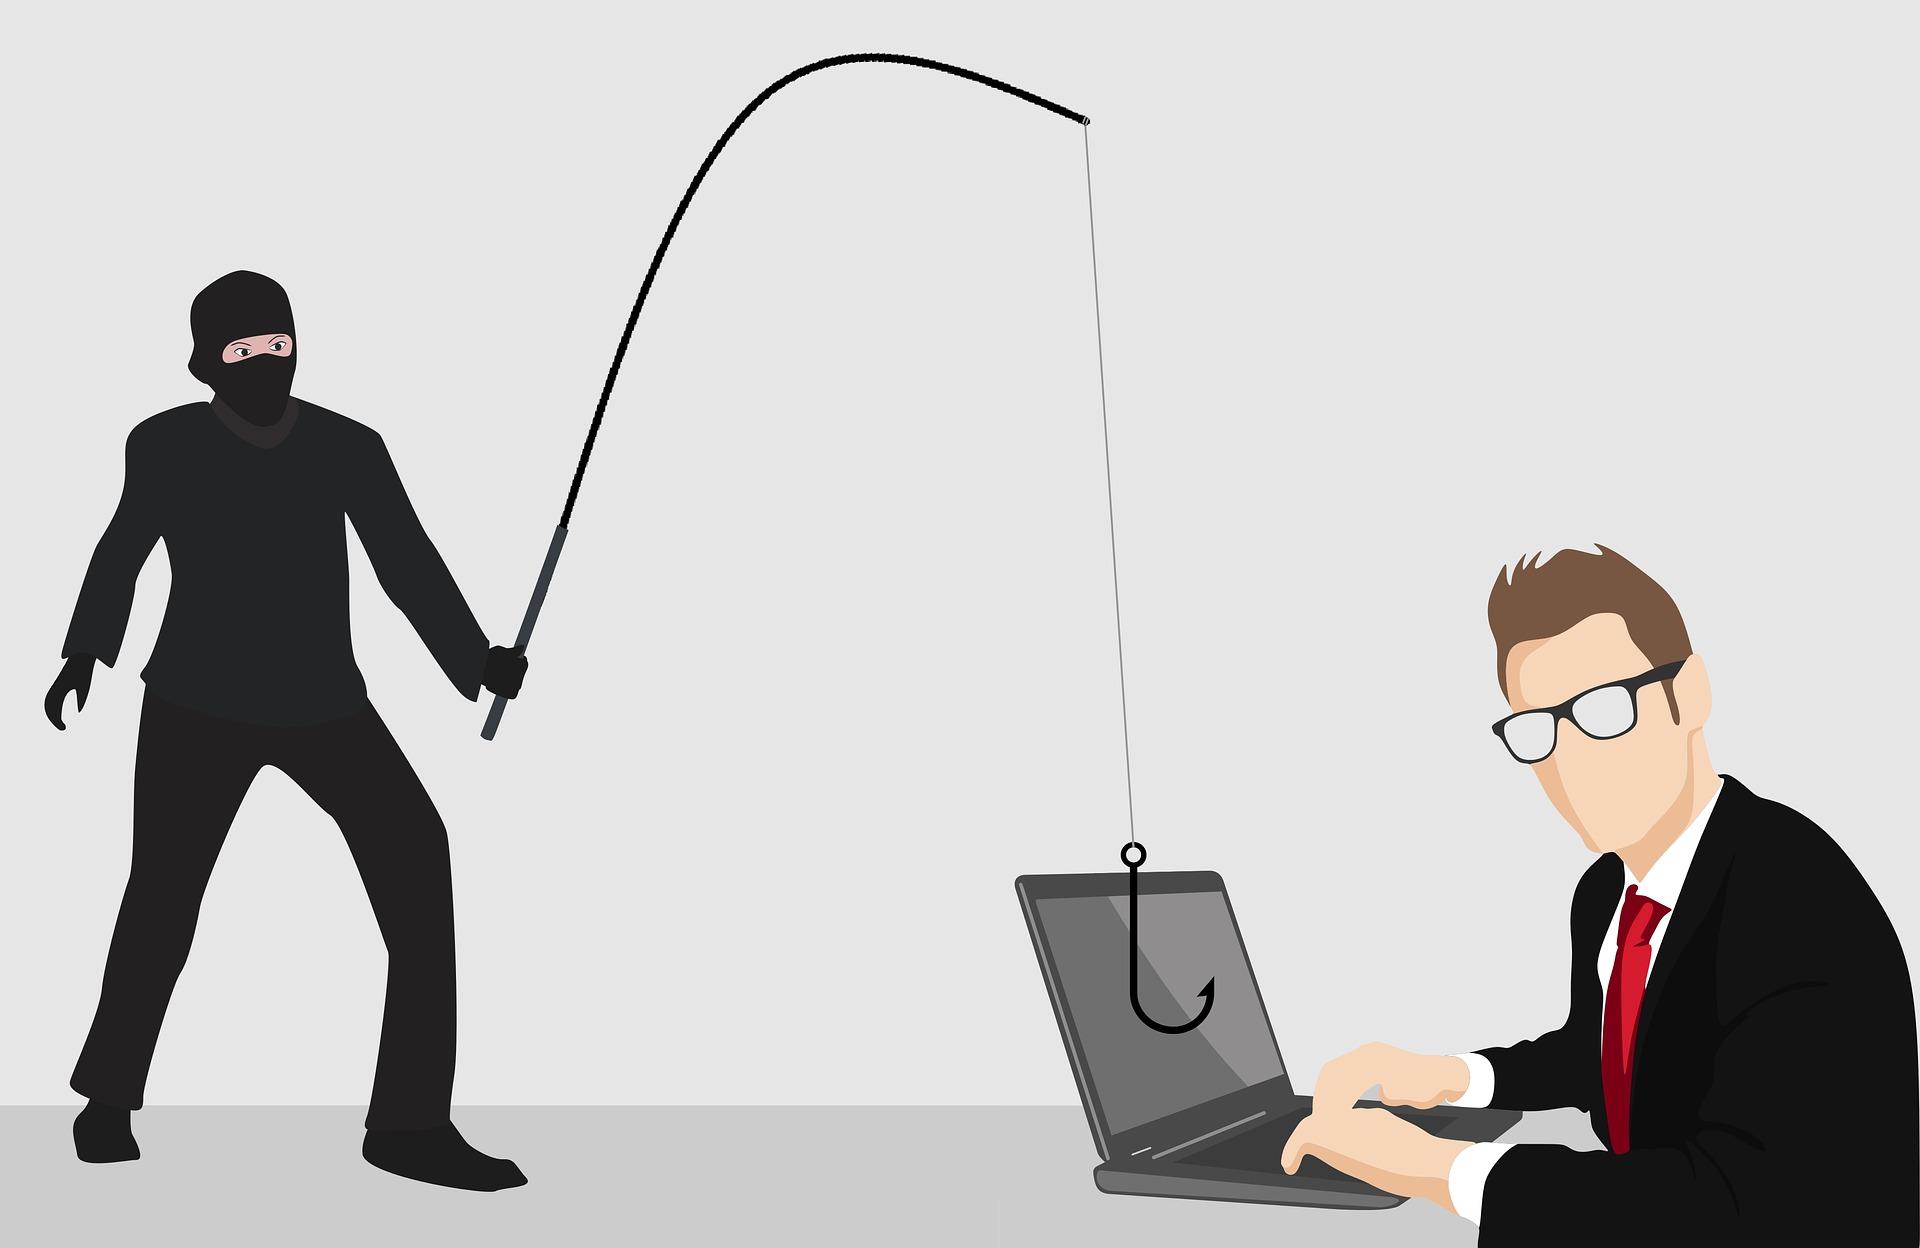 Beware of Washington State University WSU Network ID (NID) Phishing Scams